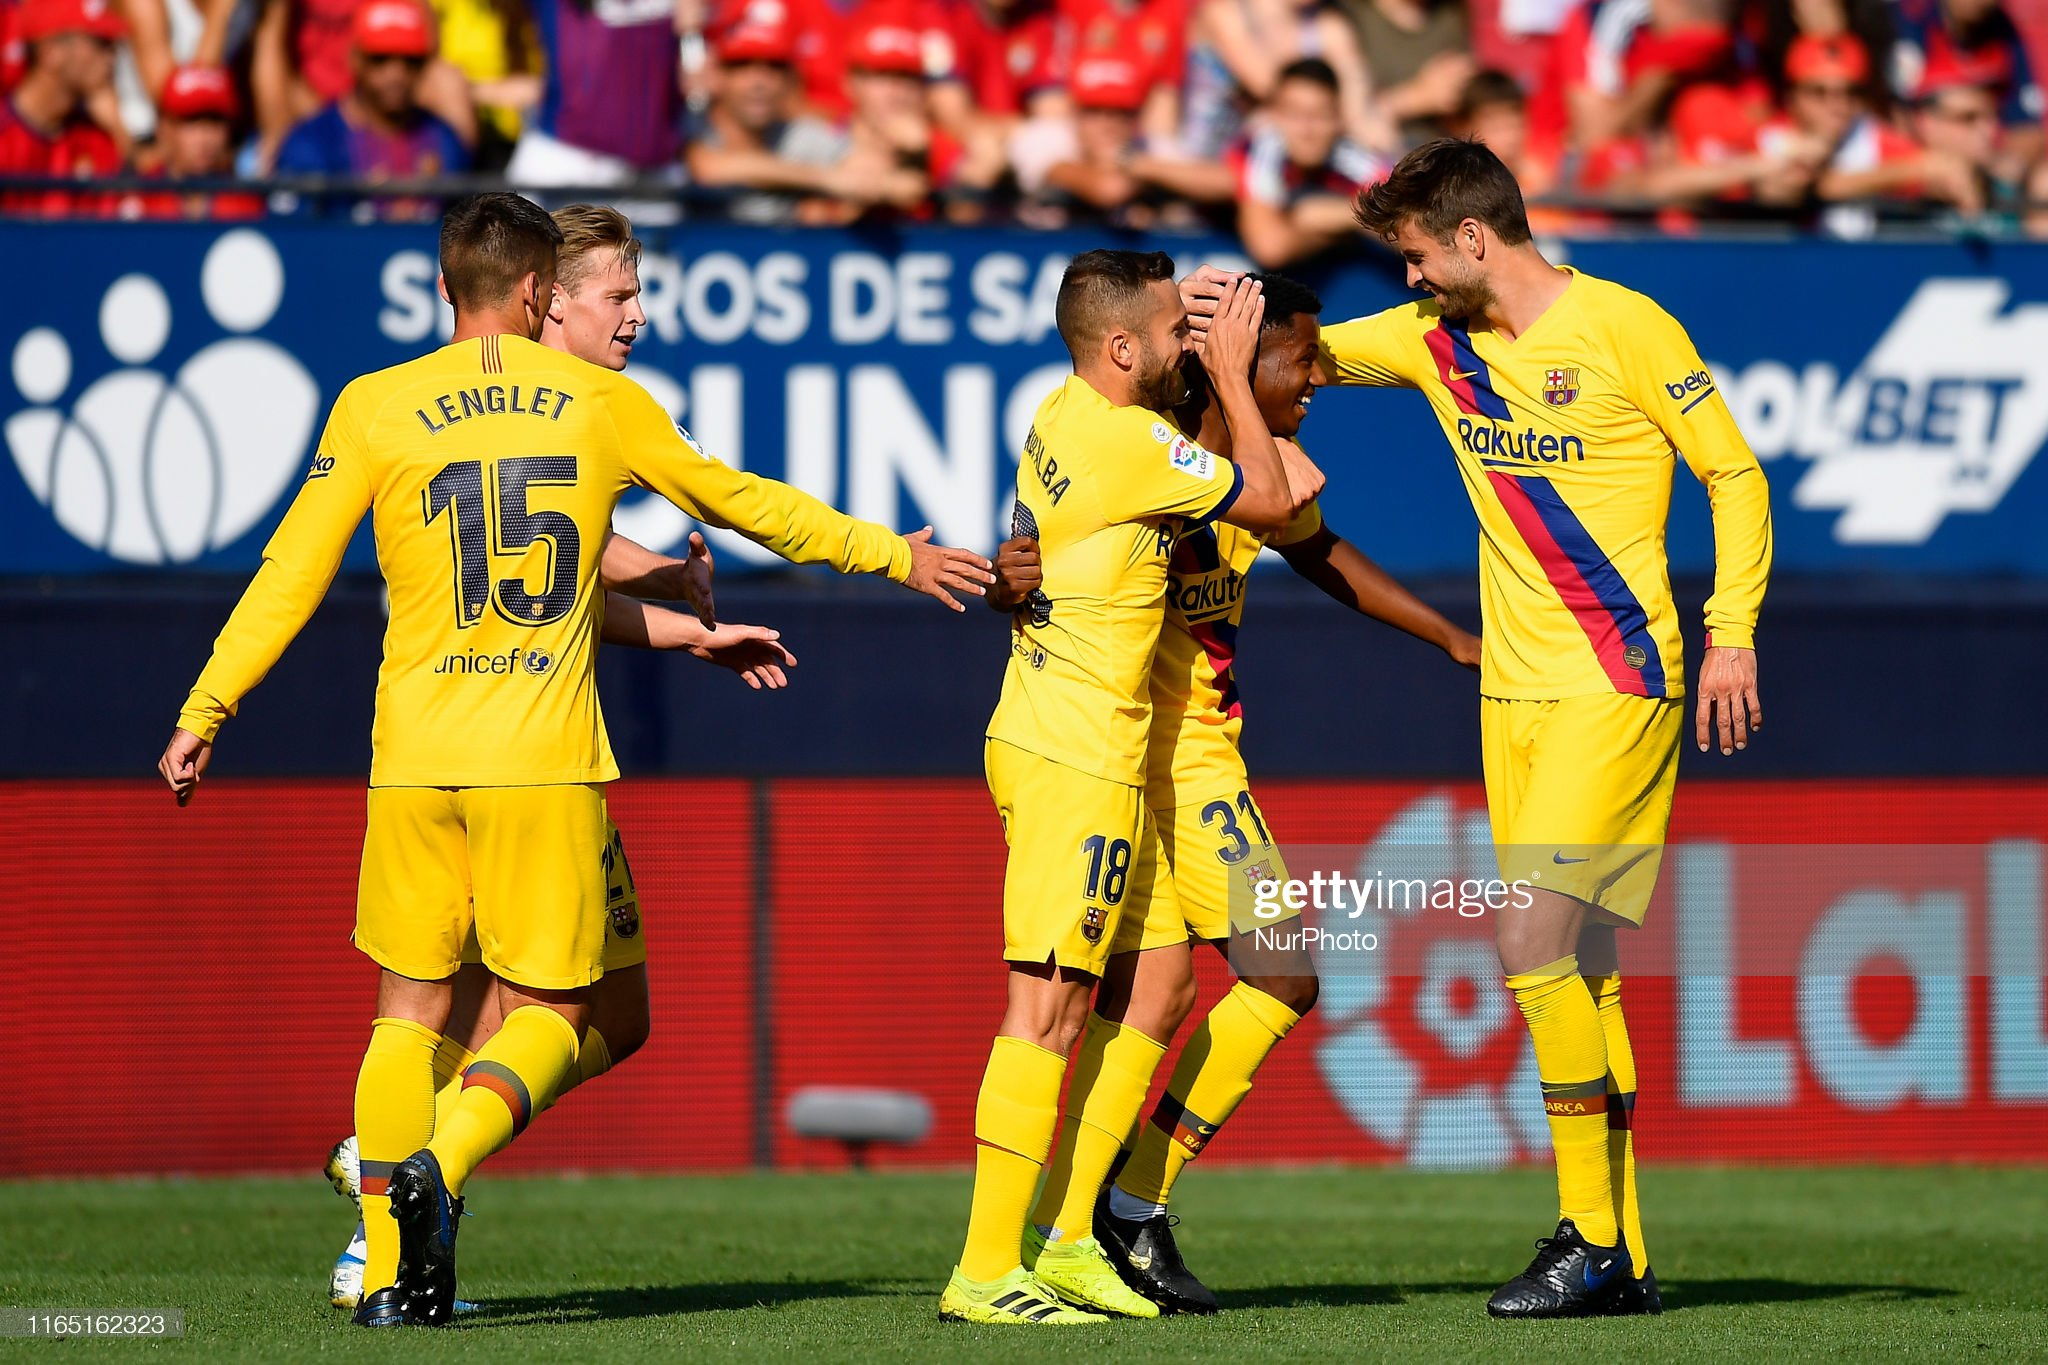 صور مباراة : أوساسونا - برشلونة 2-2 ( 31-08-2019 )  Ansu-fati-of-barcelona-celebrates-after-scoring-his-sides-first-goal-picture-id1165162323?s=2048x2048